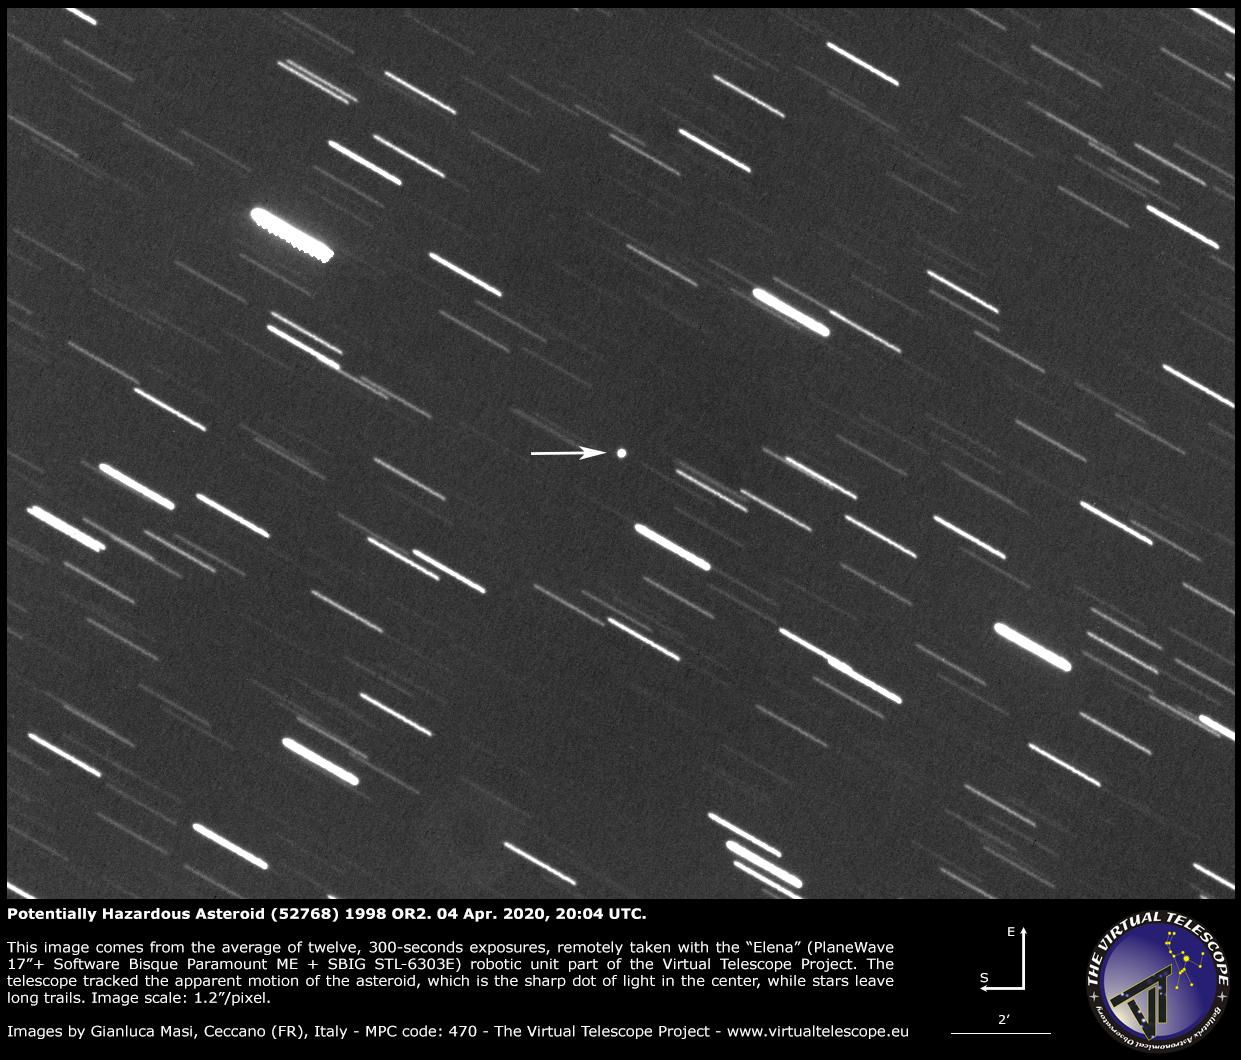 Potentially Hazardous Asteroid (52768) 1998 OR2: a image - 04 Apr. 2020